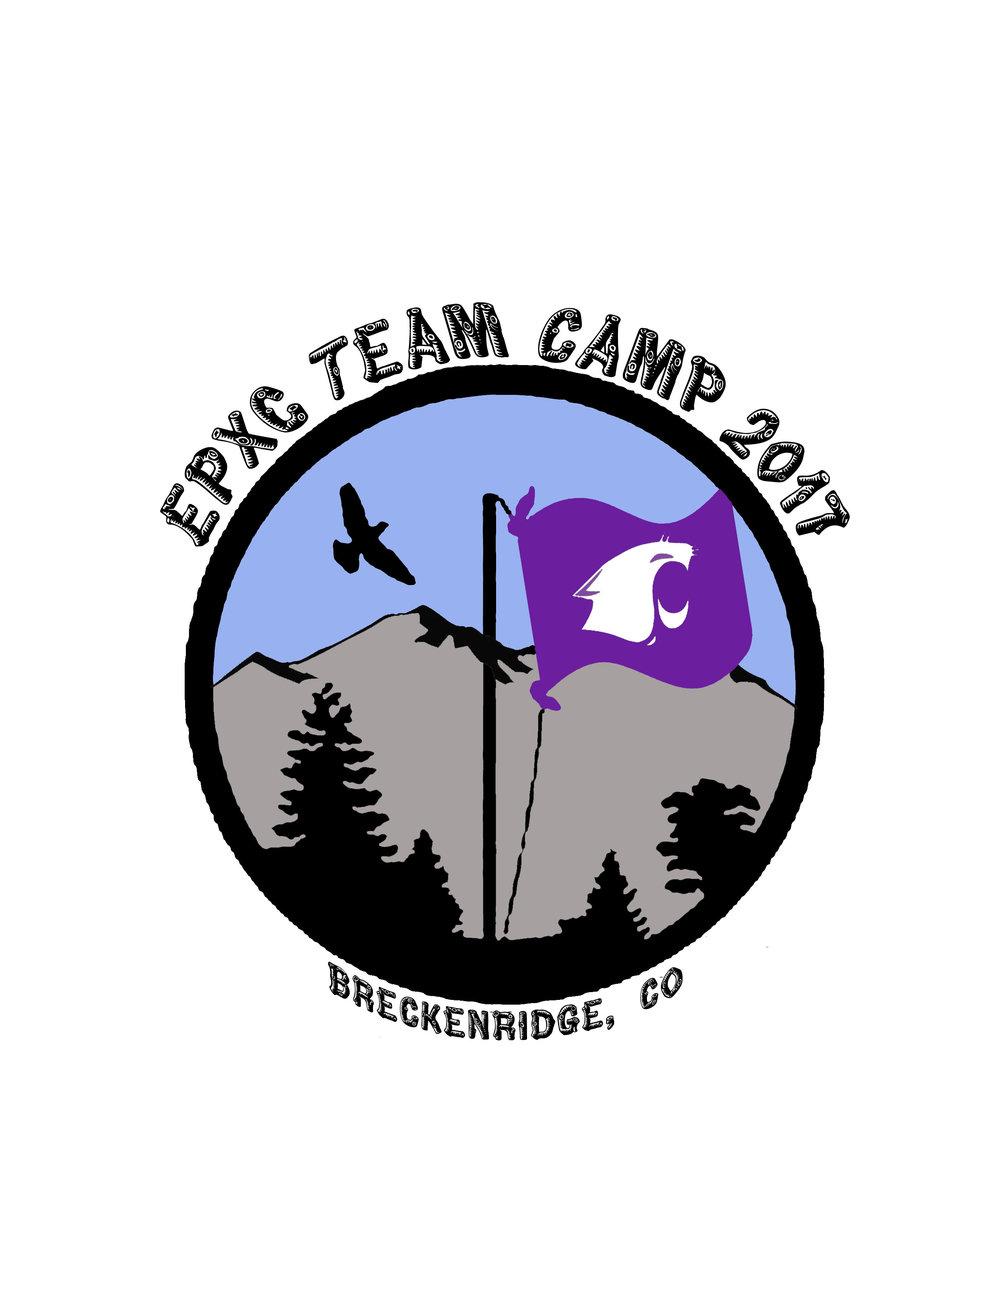 EPXC_camp_logo_color-1.jpg